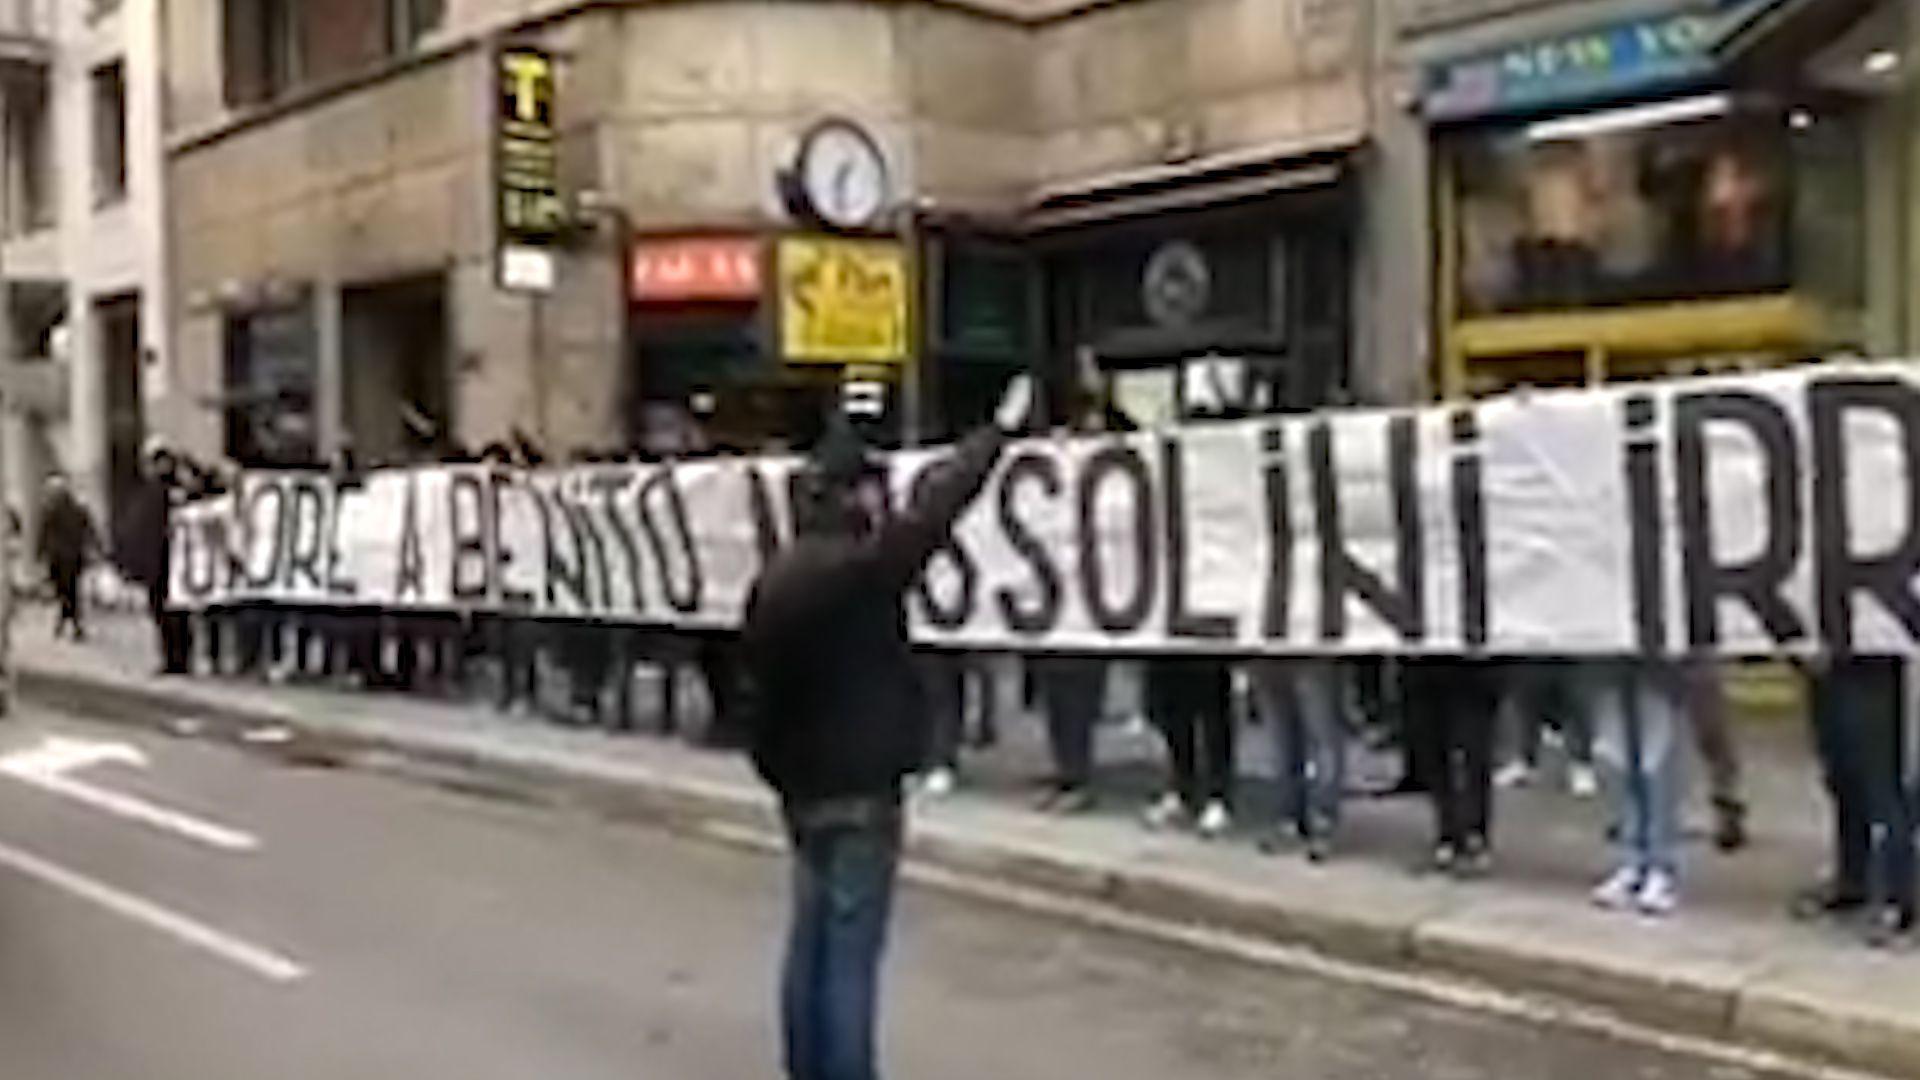 Ultras de Lazio con la bandera en honor a Benito Mussolini